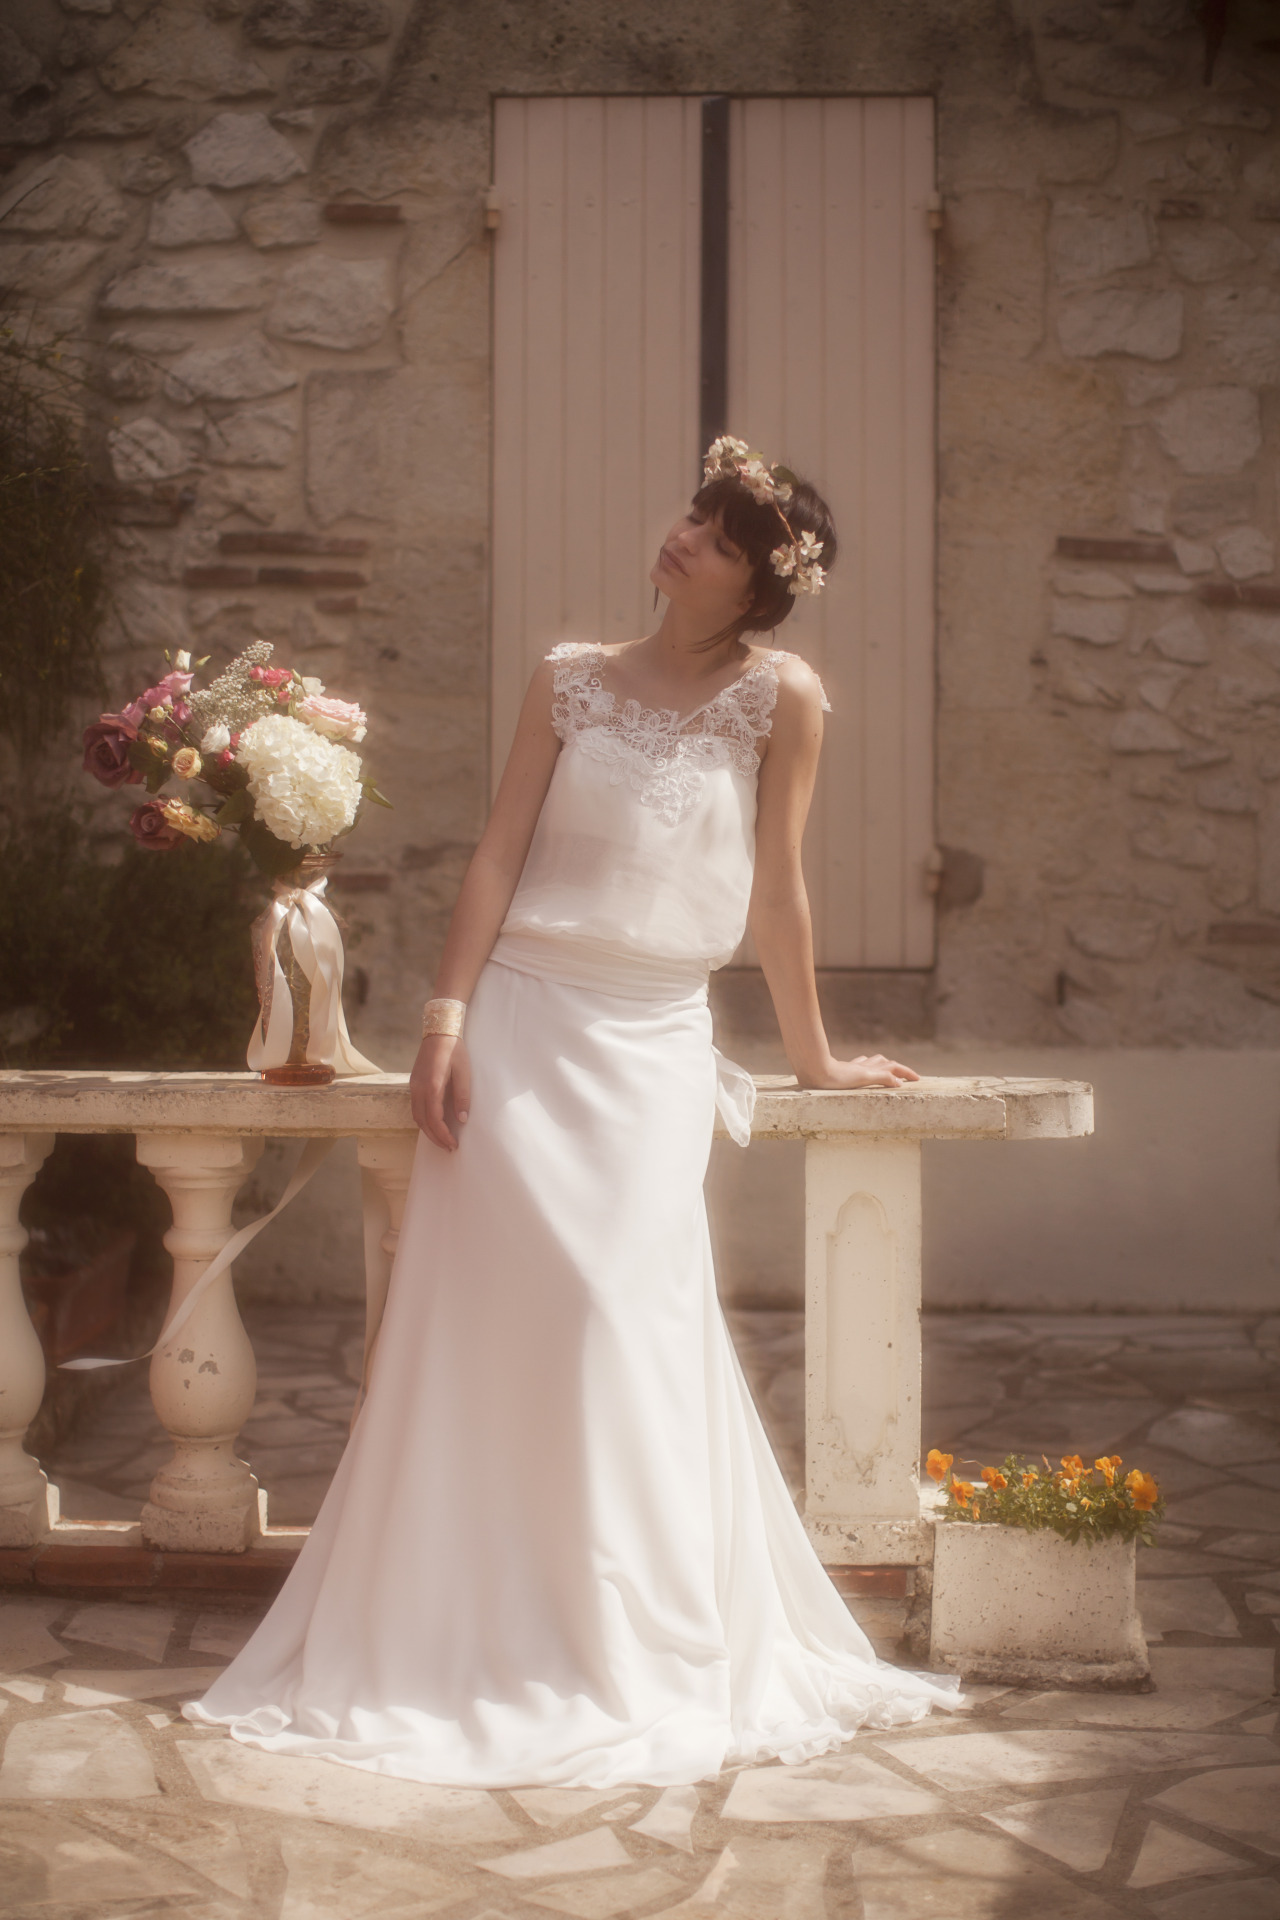 261a460f492 Robes-de-mariée-Elsa-Gary-2016-Collection-les-jolies-filles-Le ...